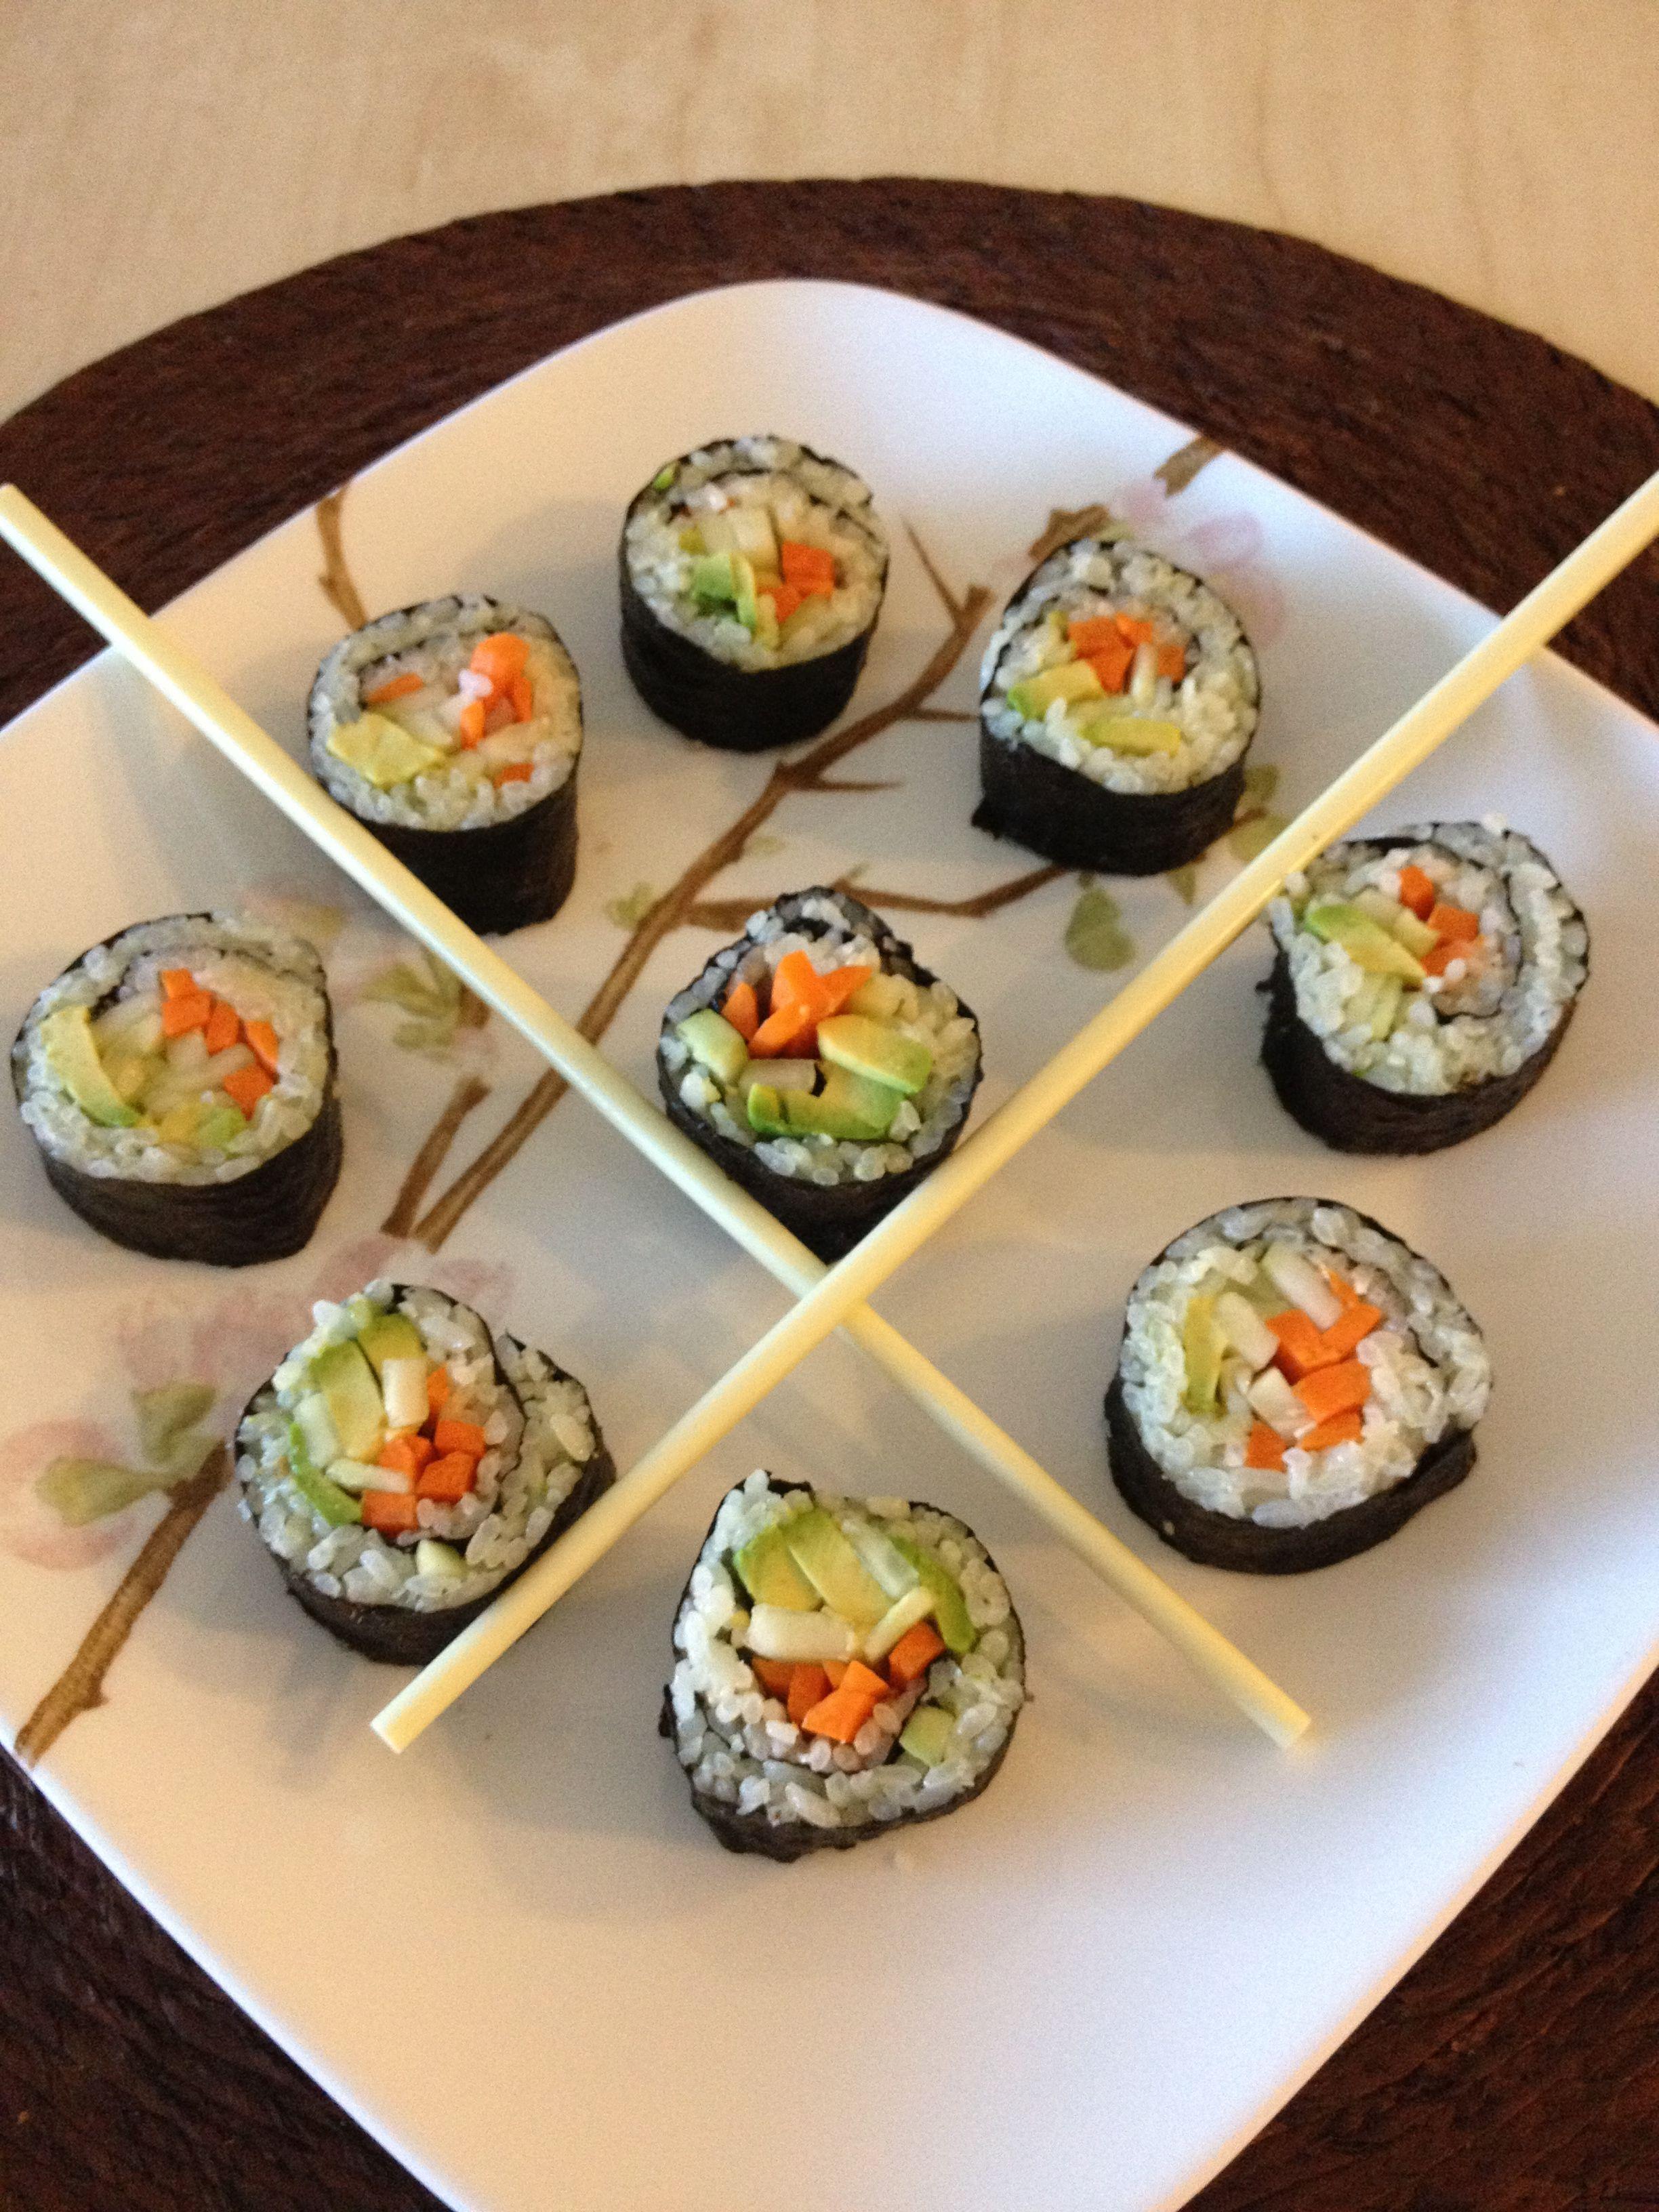 Homemade sushi.. veggie rolls made with all organic